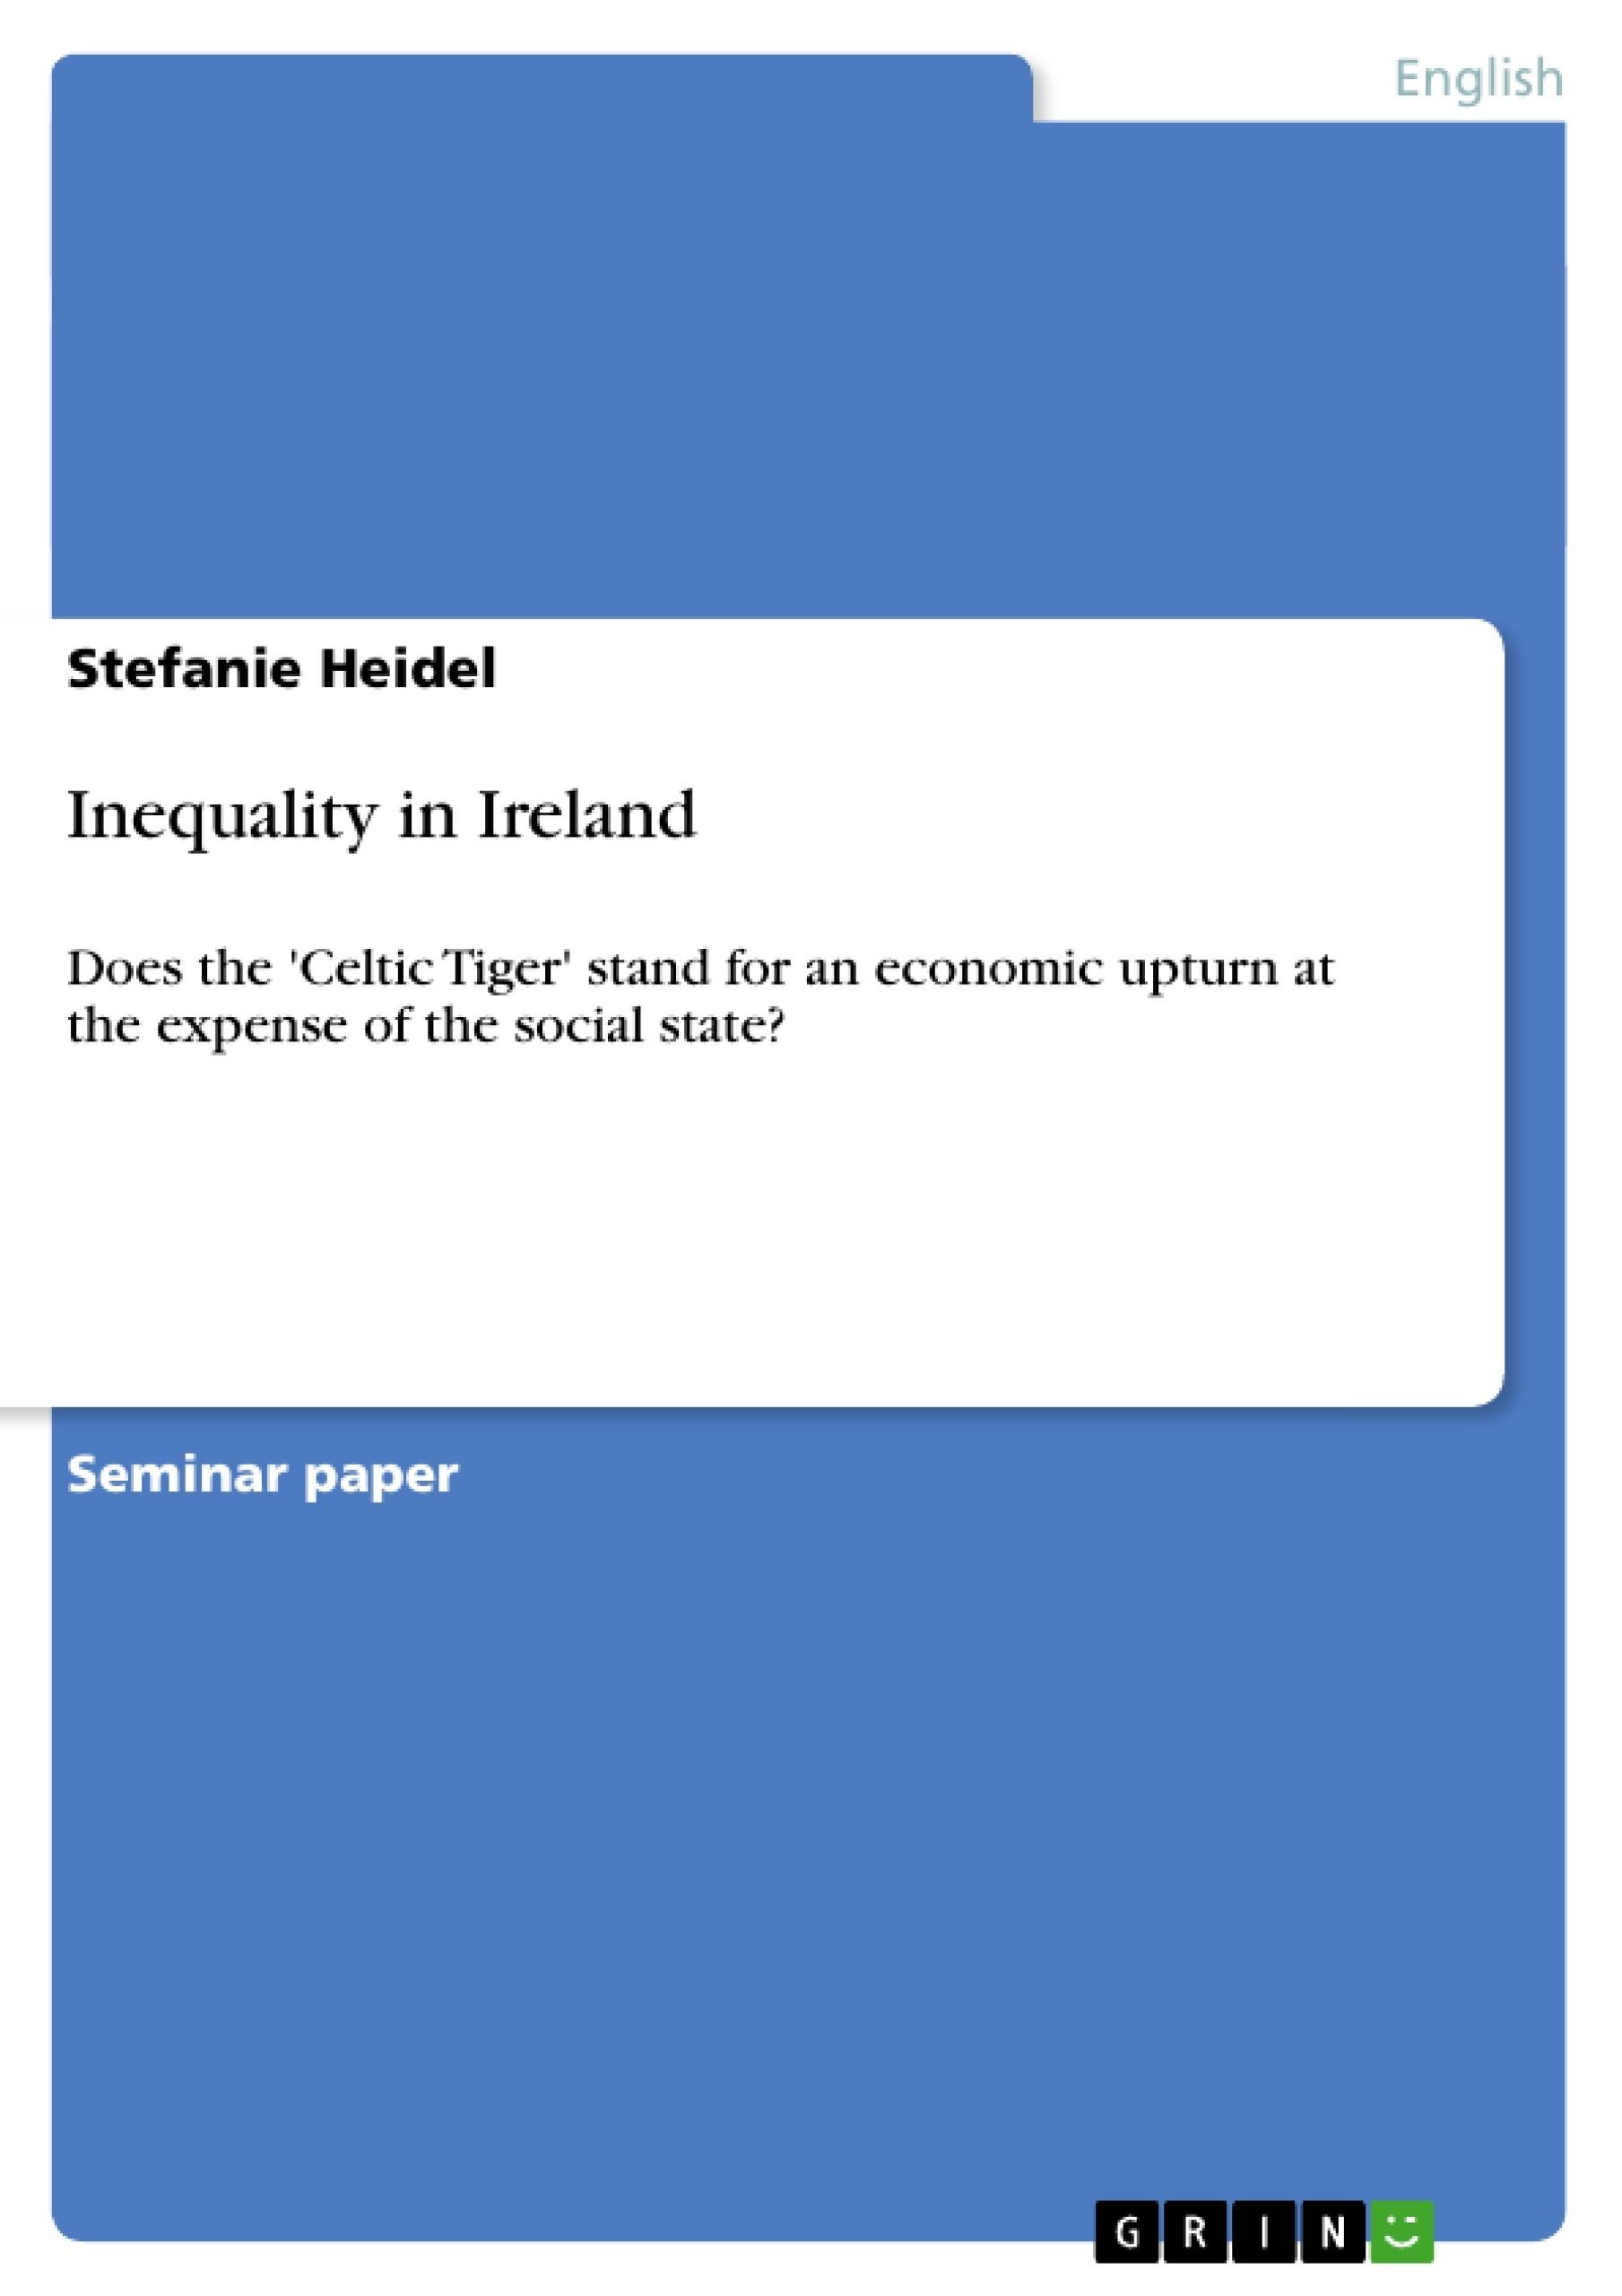 Title: Inequality in Ireland